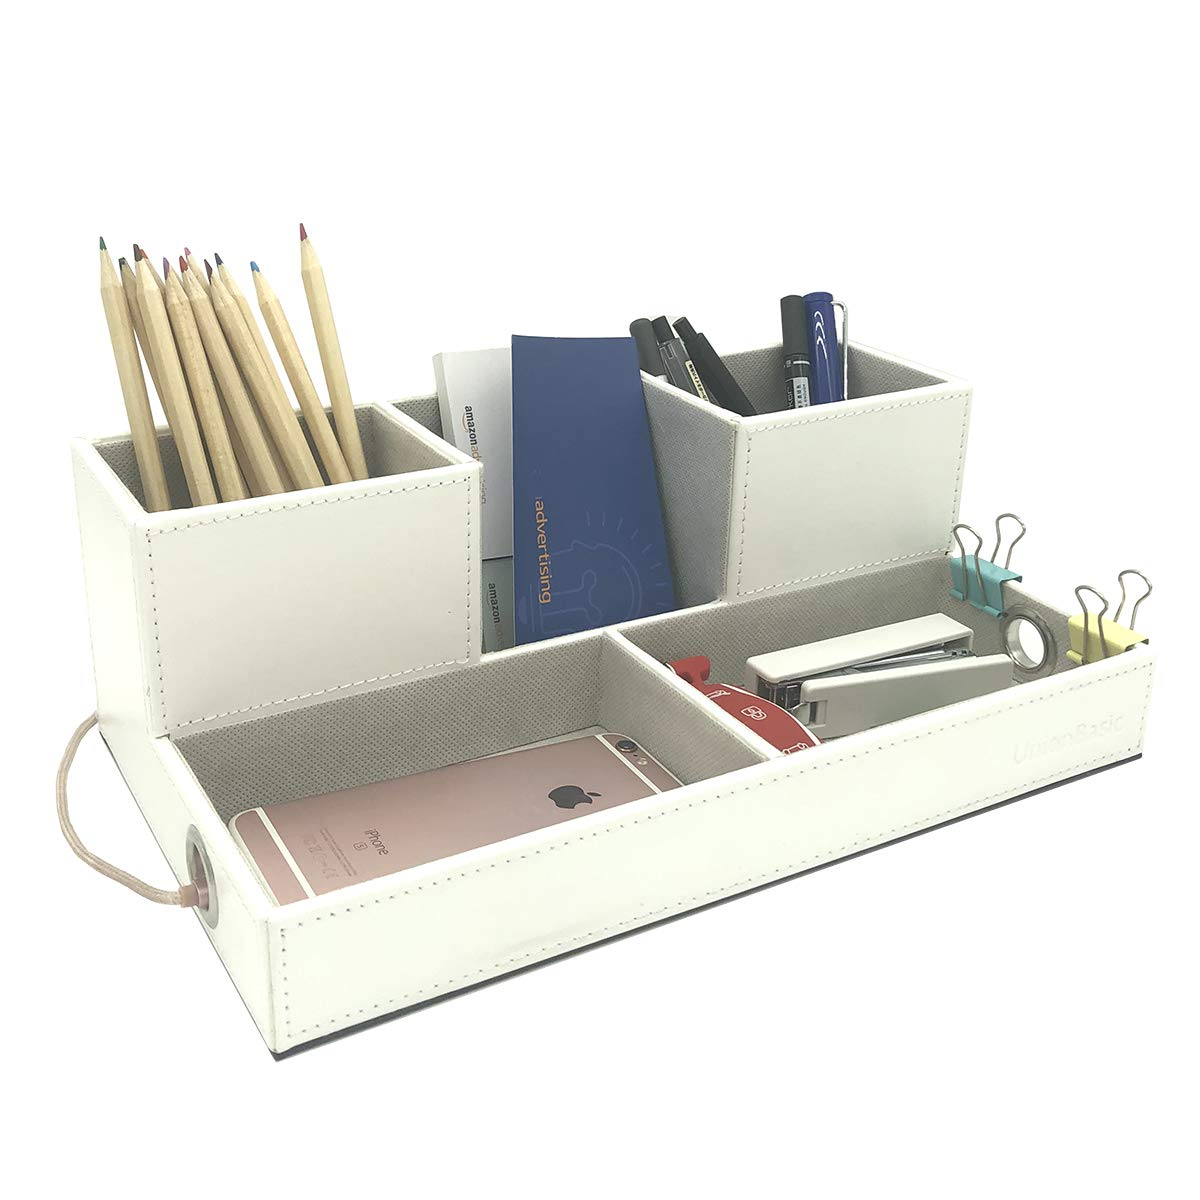 UnionBasic PU Leather 4 Compartment Desk Organizer Card/Pen/Pencil/Mobile Phone Office Supplies Holder Collection Desktop Organizer (Large White)